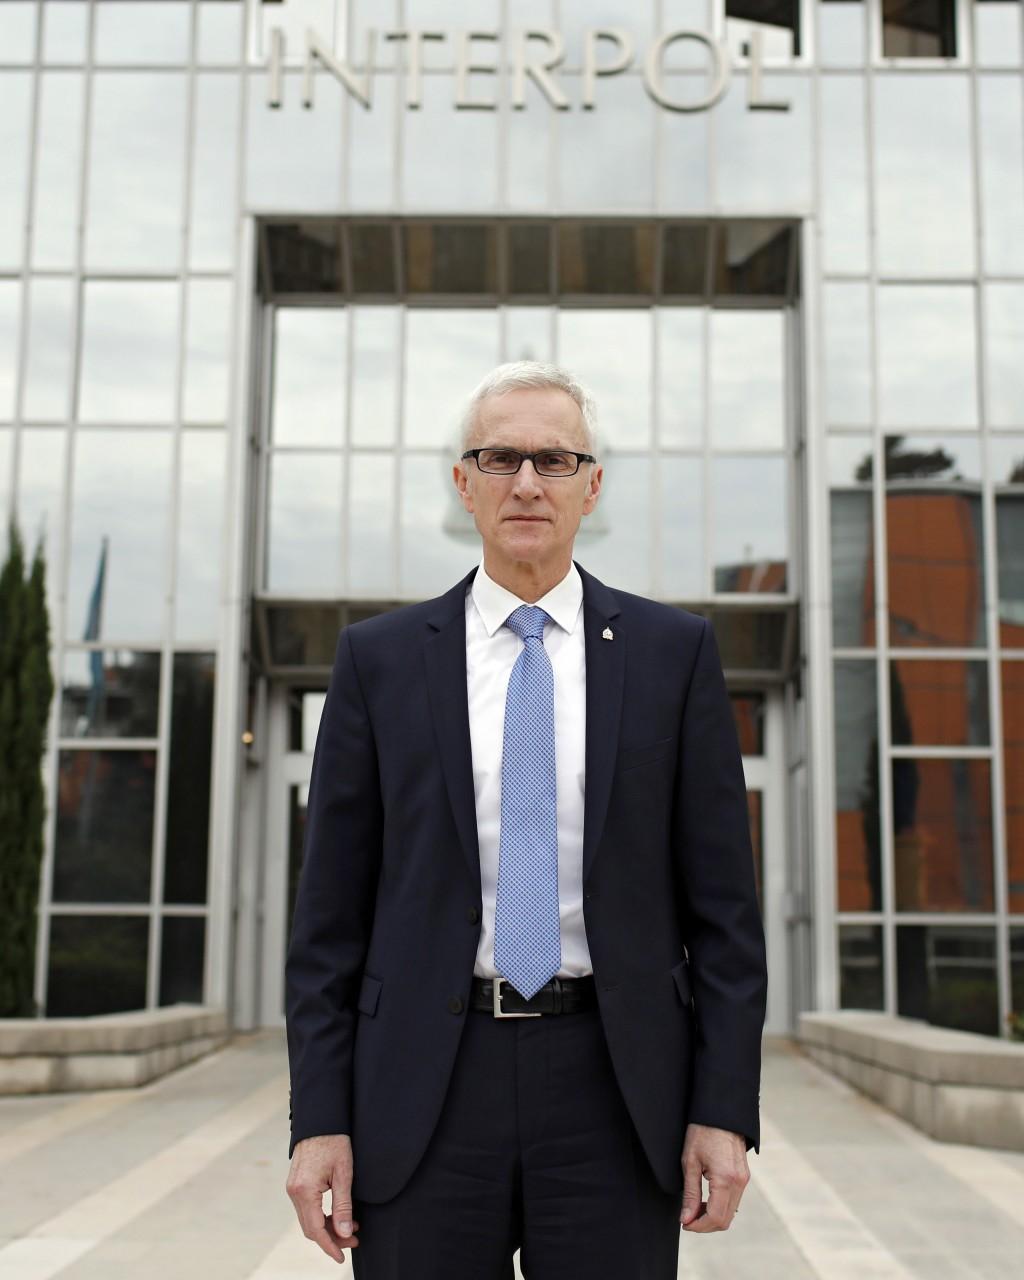 Interpol Secretary General Jurgen Stock poses a the international police agency in Lyon, central France, Thursday, Nov.8, 2018. (AP Photo/Laurent Cipr